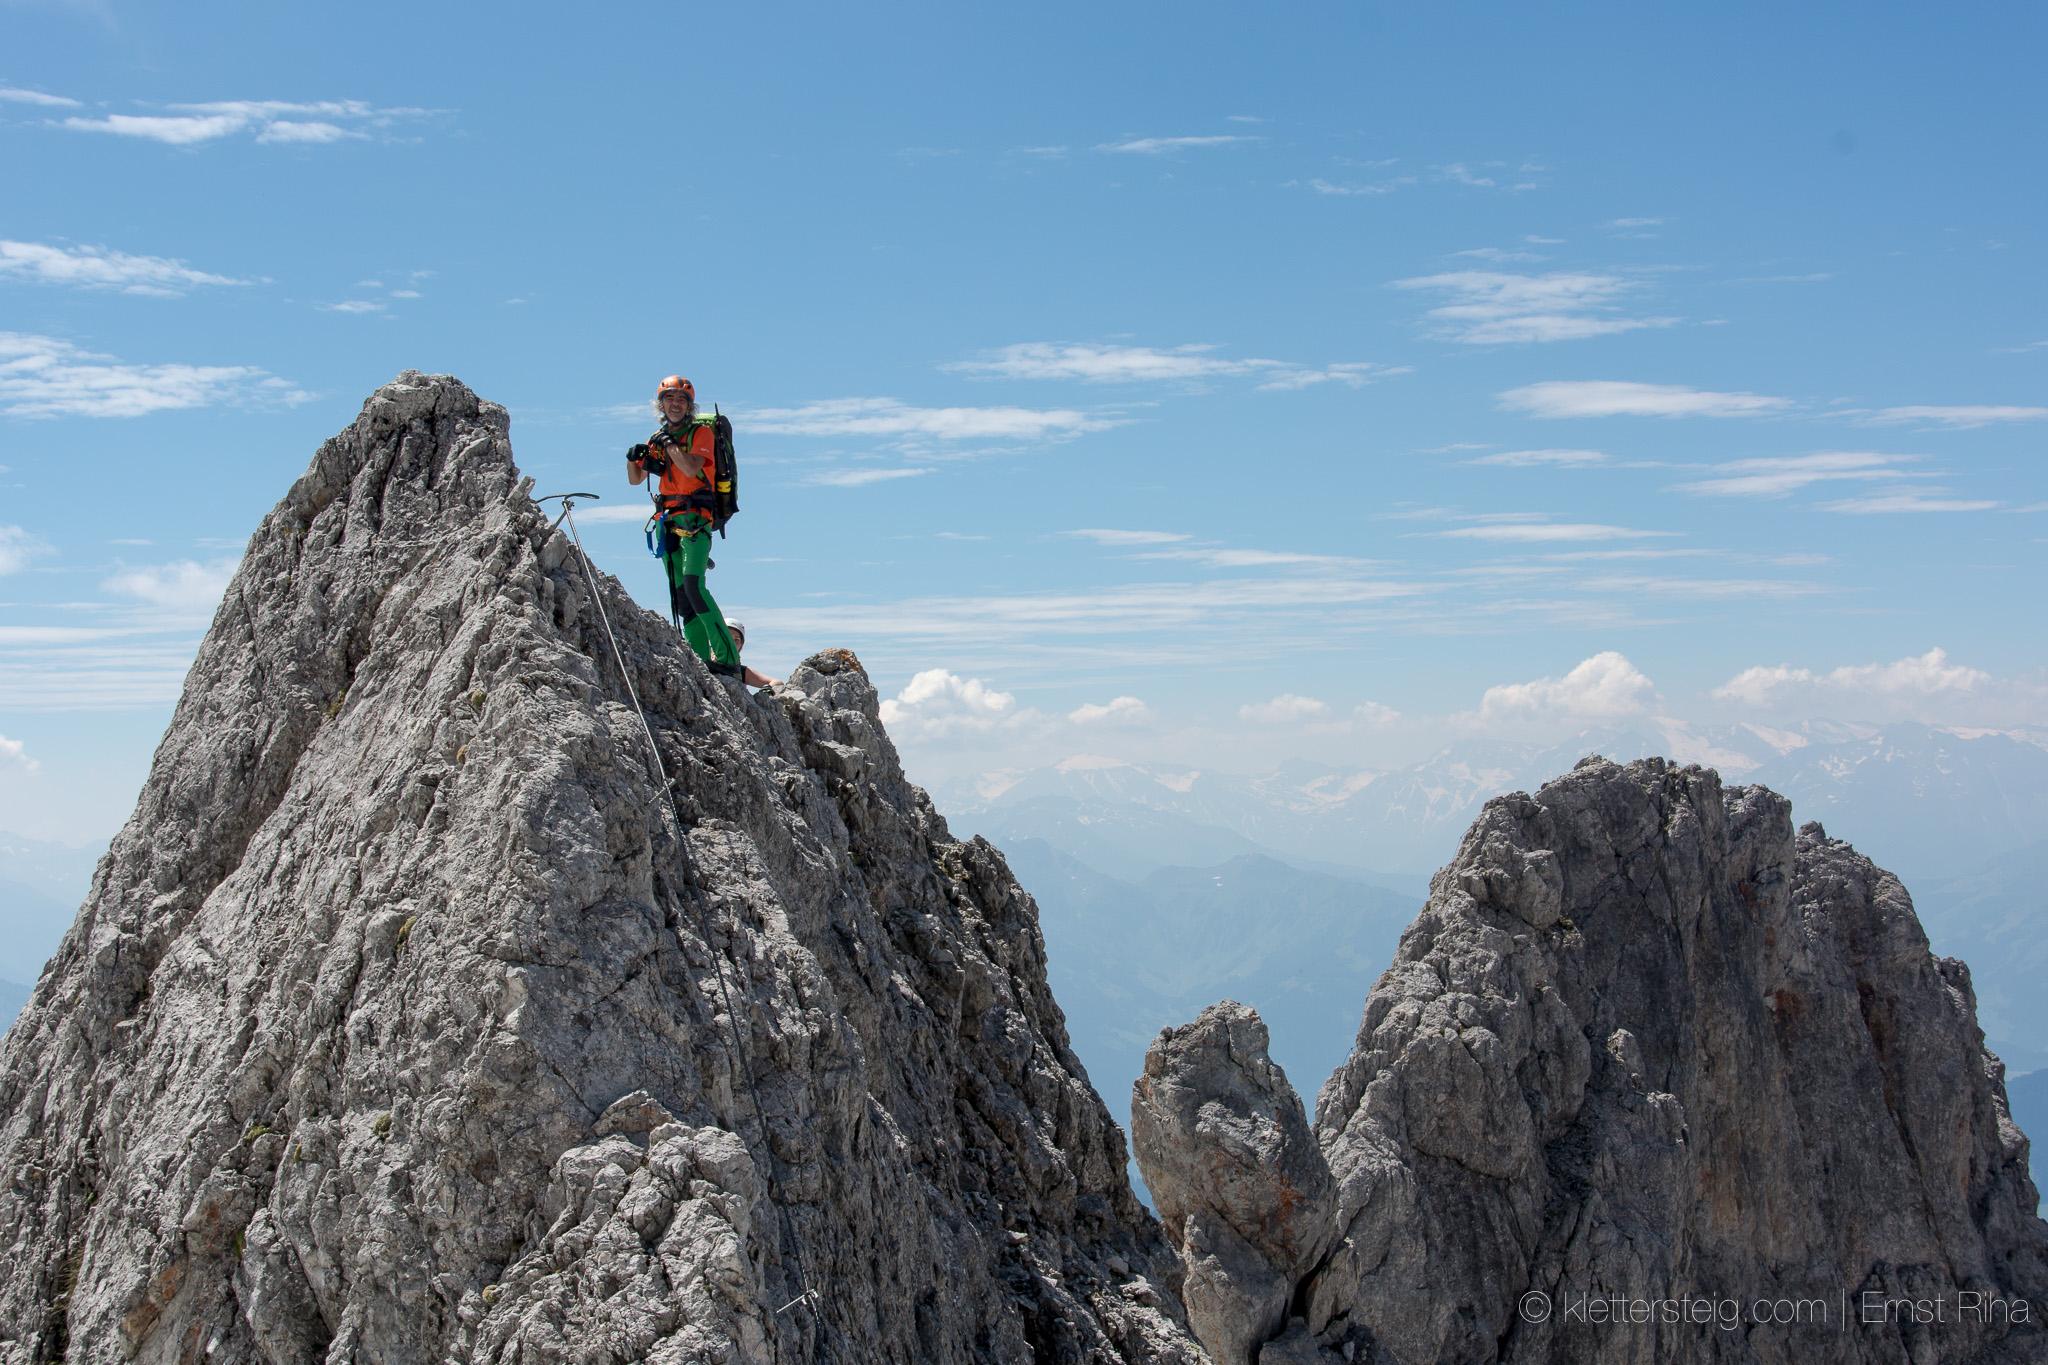 Klettersteig Königsjodler : Königsjodler klettersteig am hochkönig m youtube